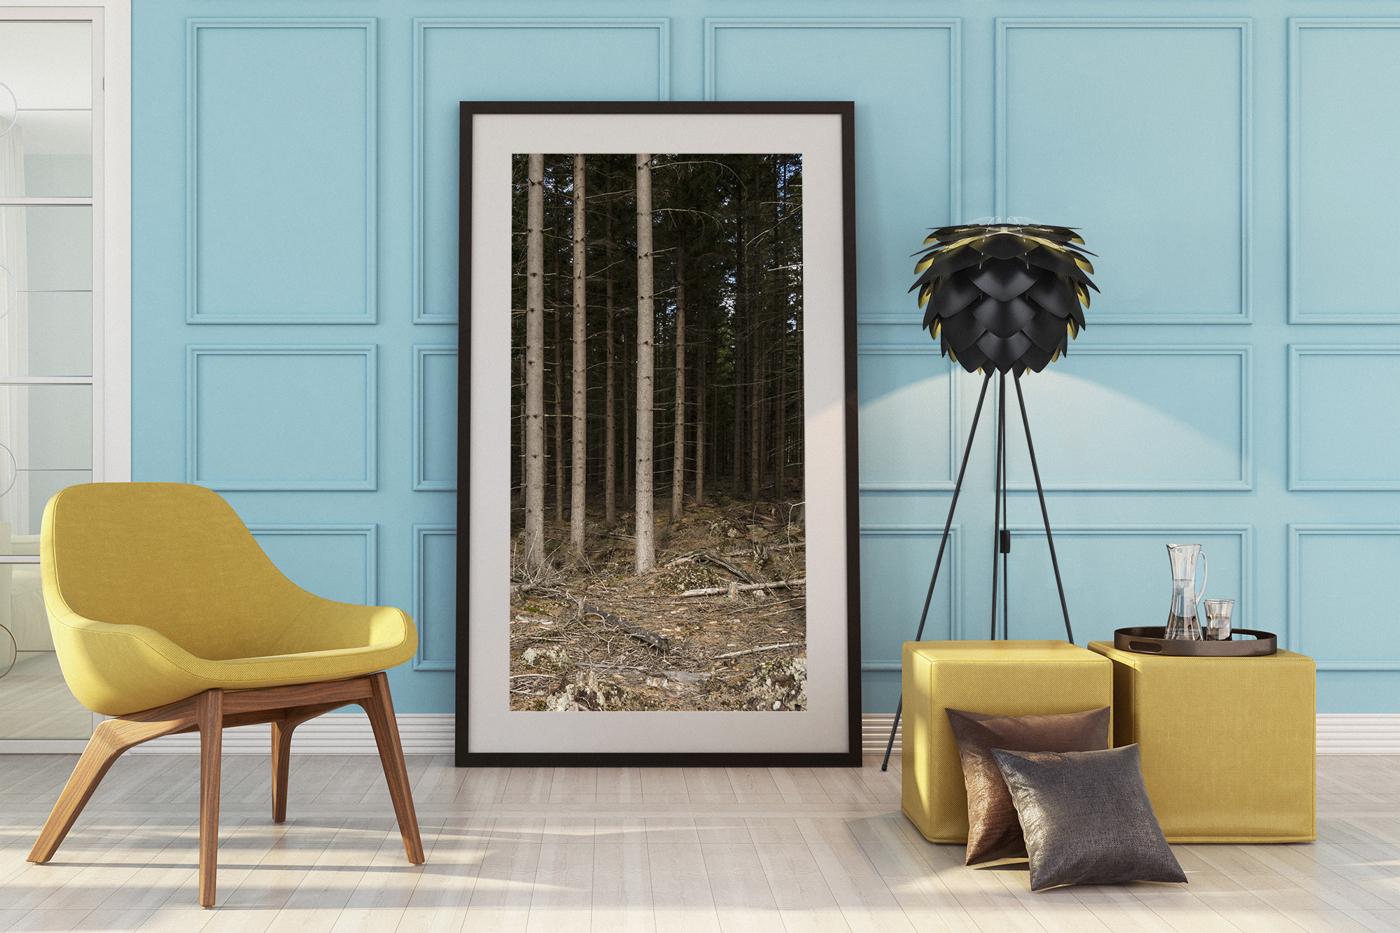 svart-guld-lampa-bordslampa-design-stilren-snygg-taklampa-kottlampa_ZnUrco